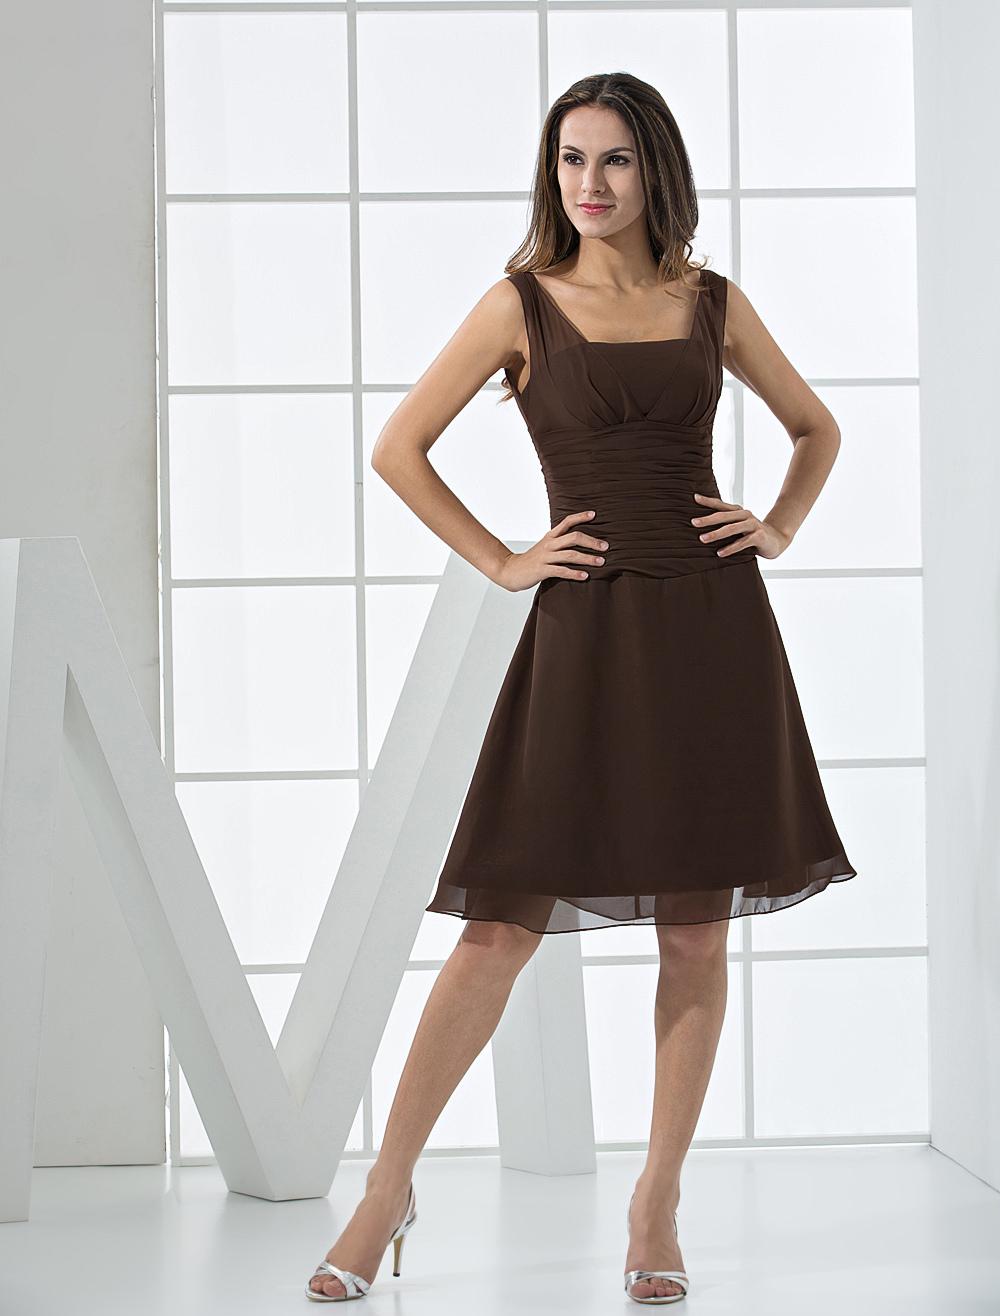 robe de cocktail chocolat de col carr longueur genou milanoocom - Milanoo Robe De Soiree Pour Mariage